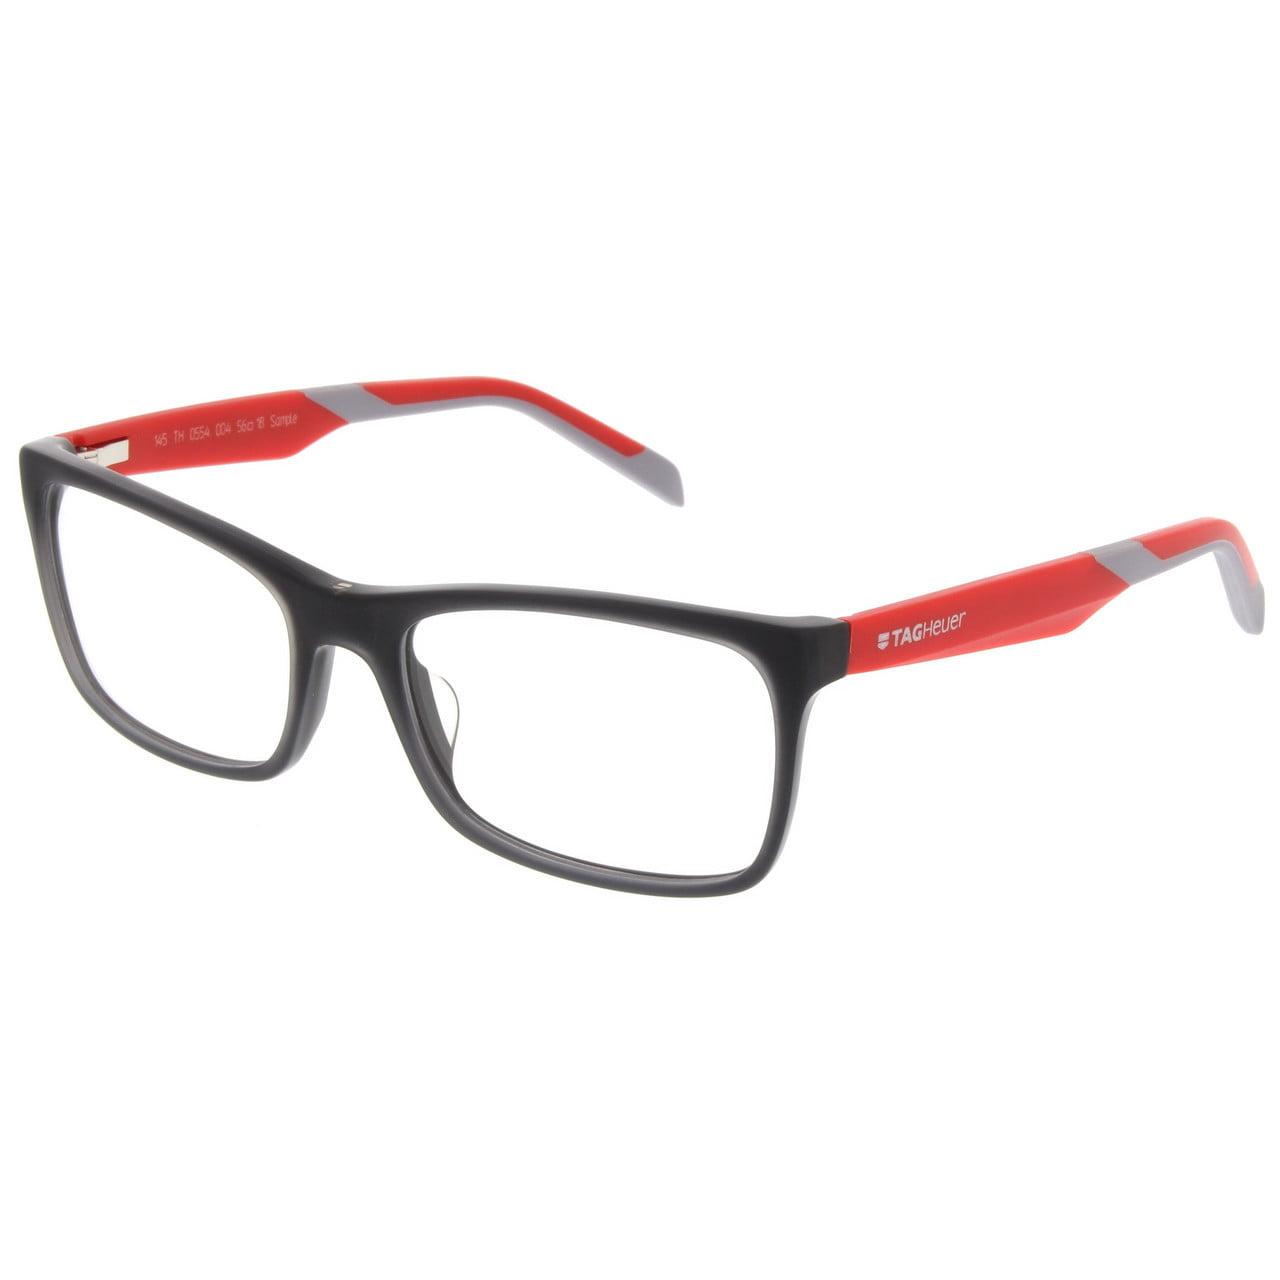 868ee739bd0 TAG Heuer B-URBAN Glasses Rectangle Prescription Rx Ready Eyeglasses ...